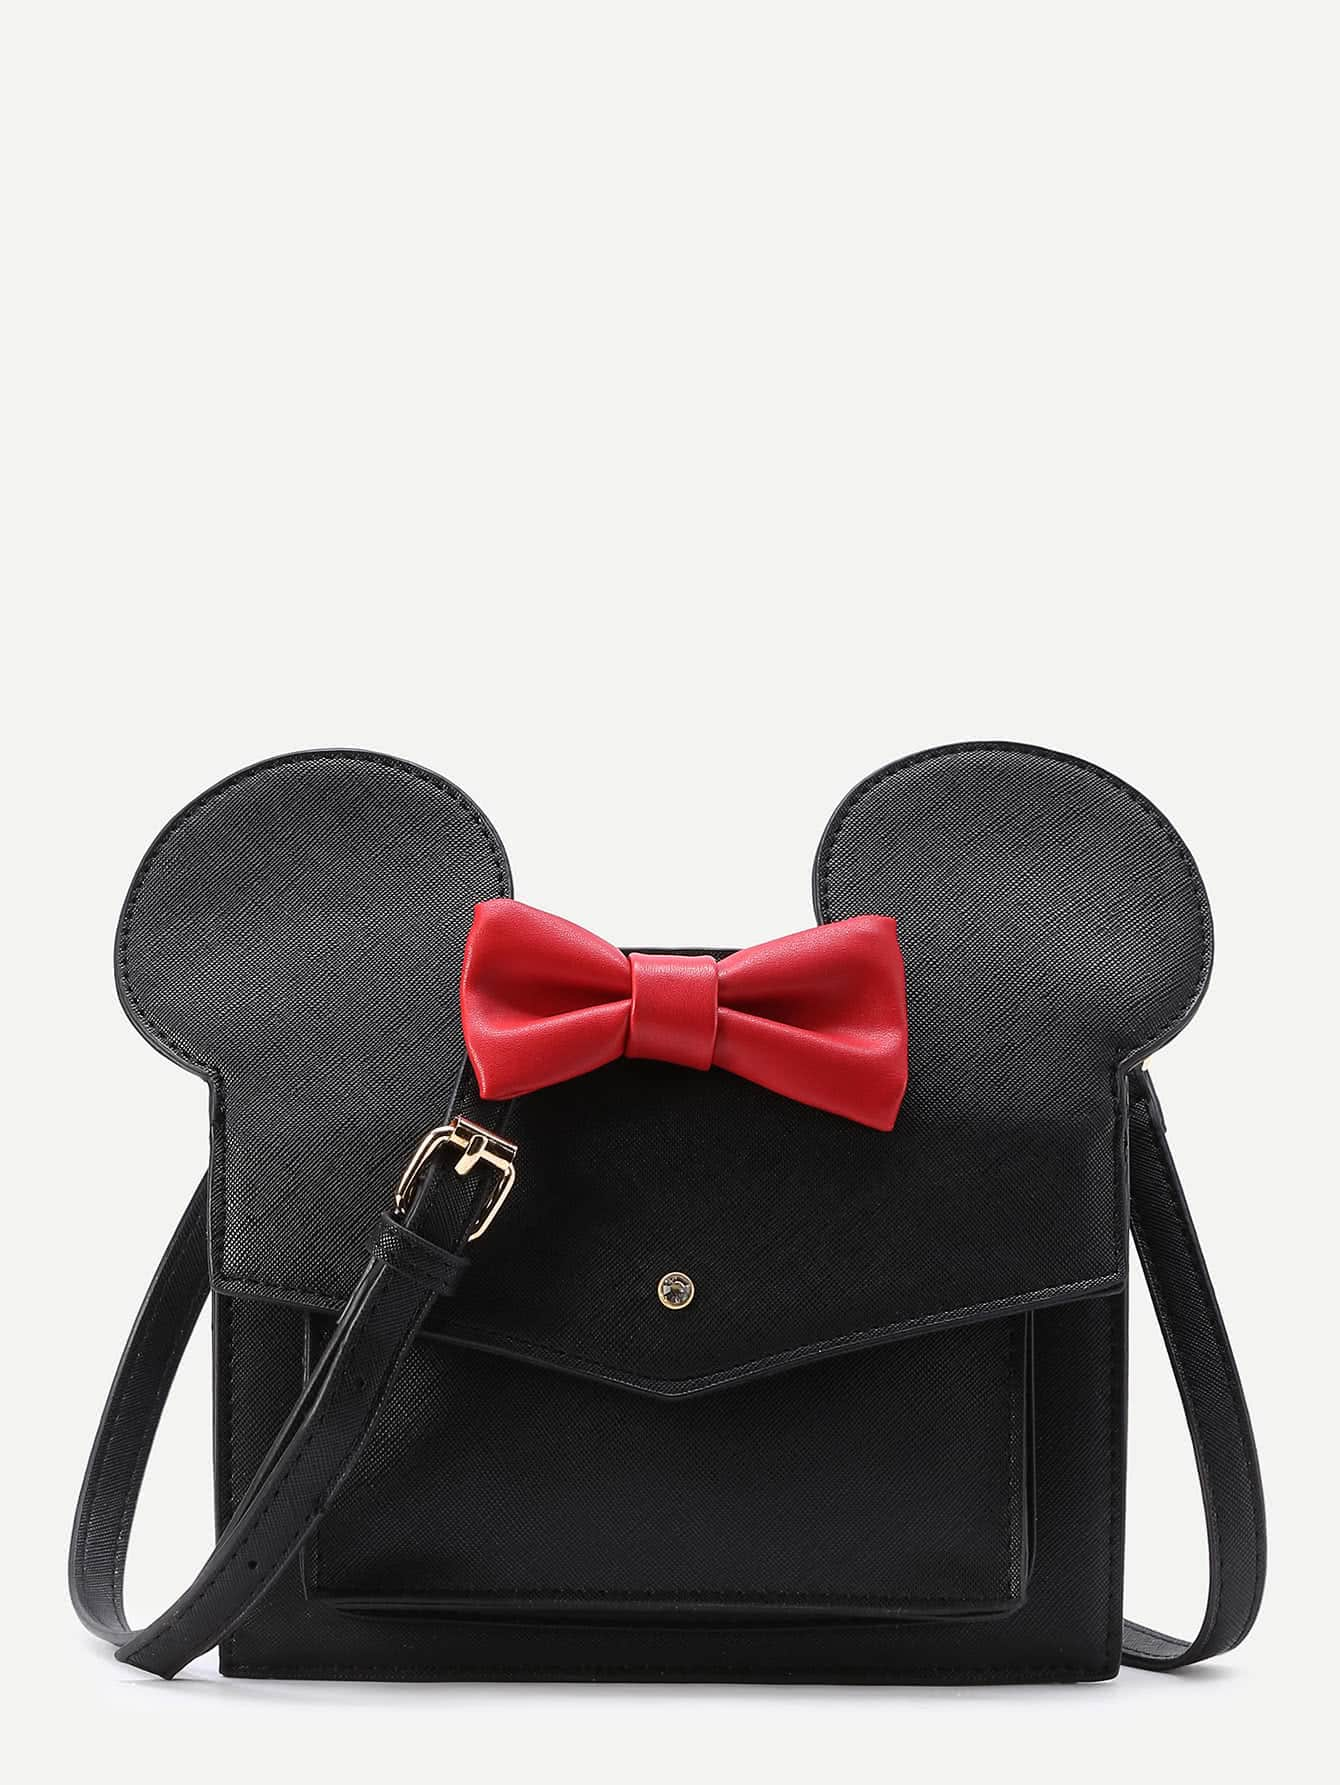 Bow Decor Flap Shoulder Bag